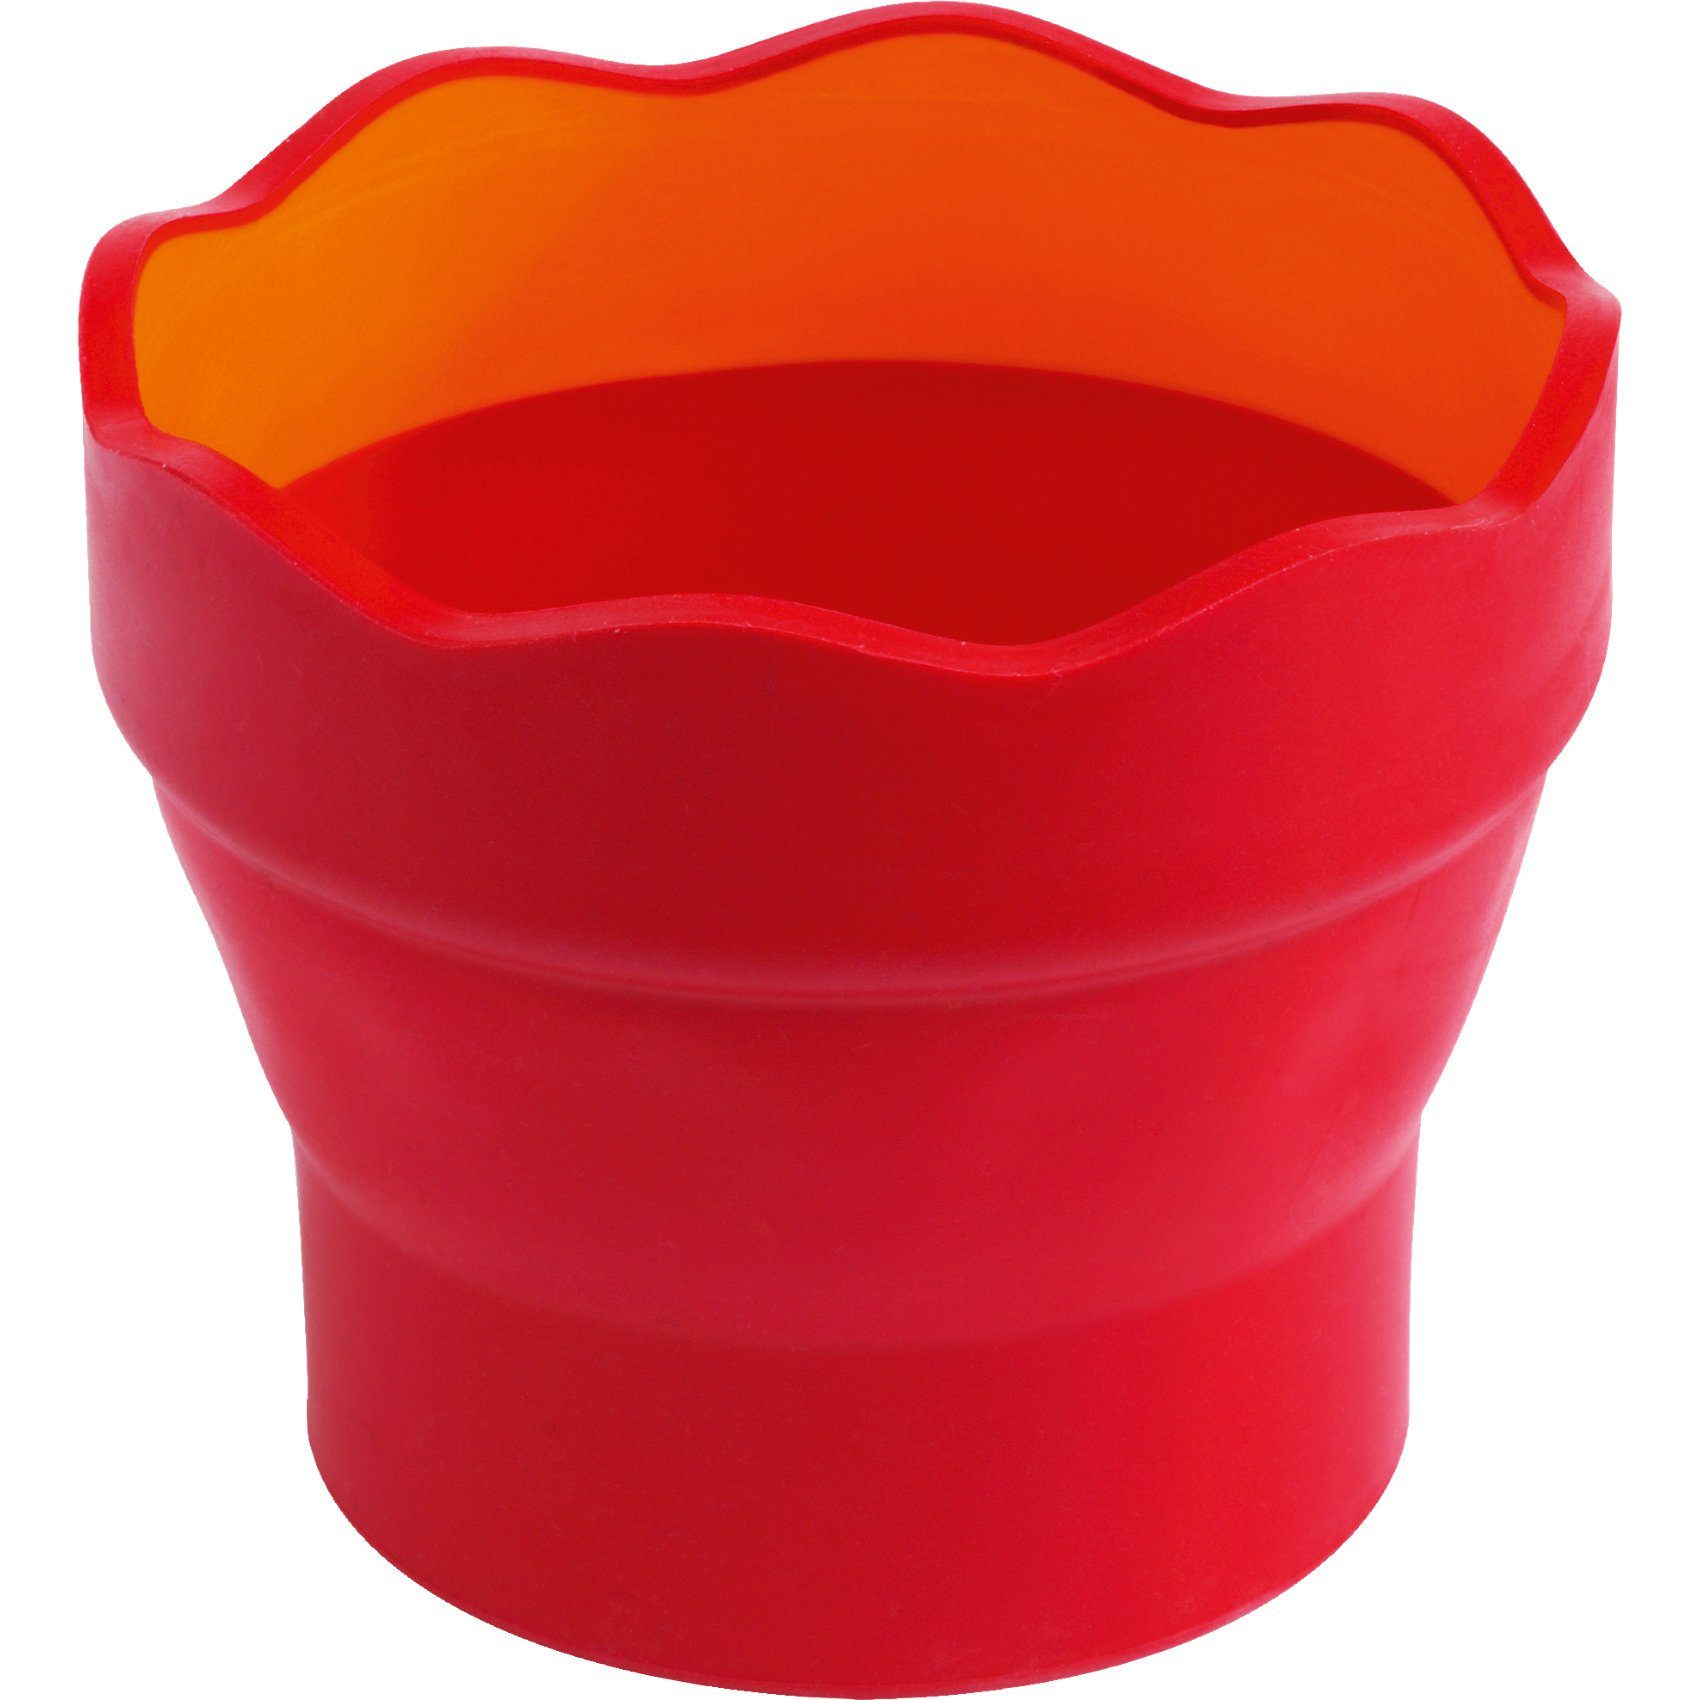 Faber-Castell CLIC & GO Wasserfaltbecher rot/orange